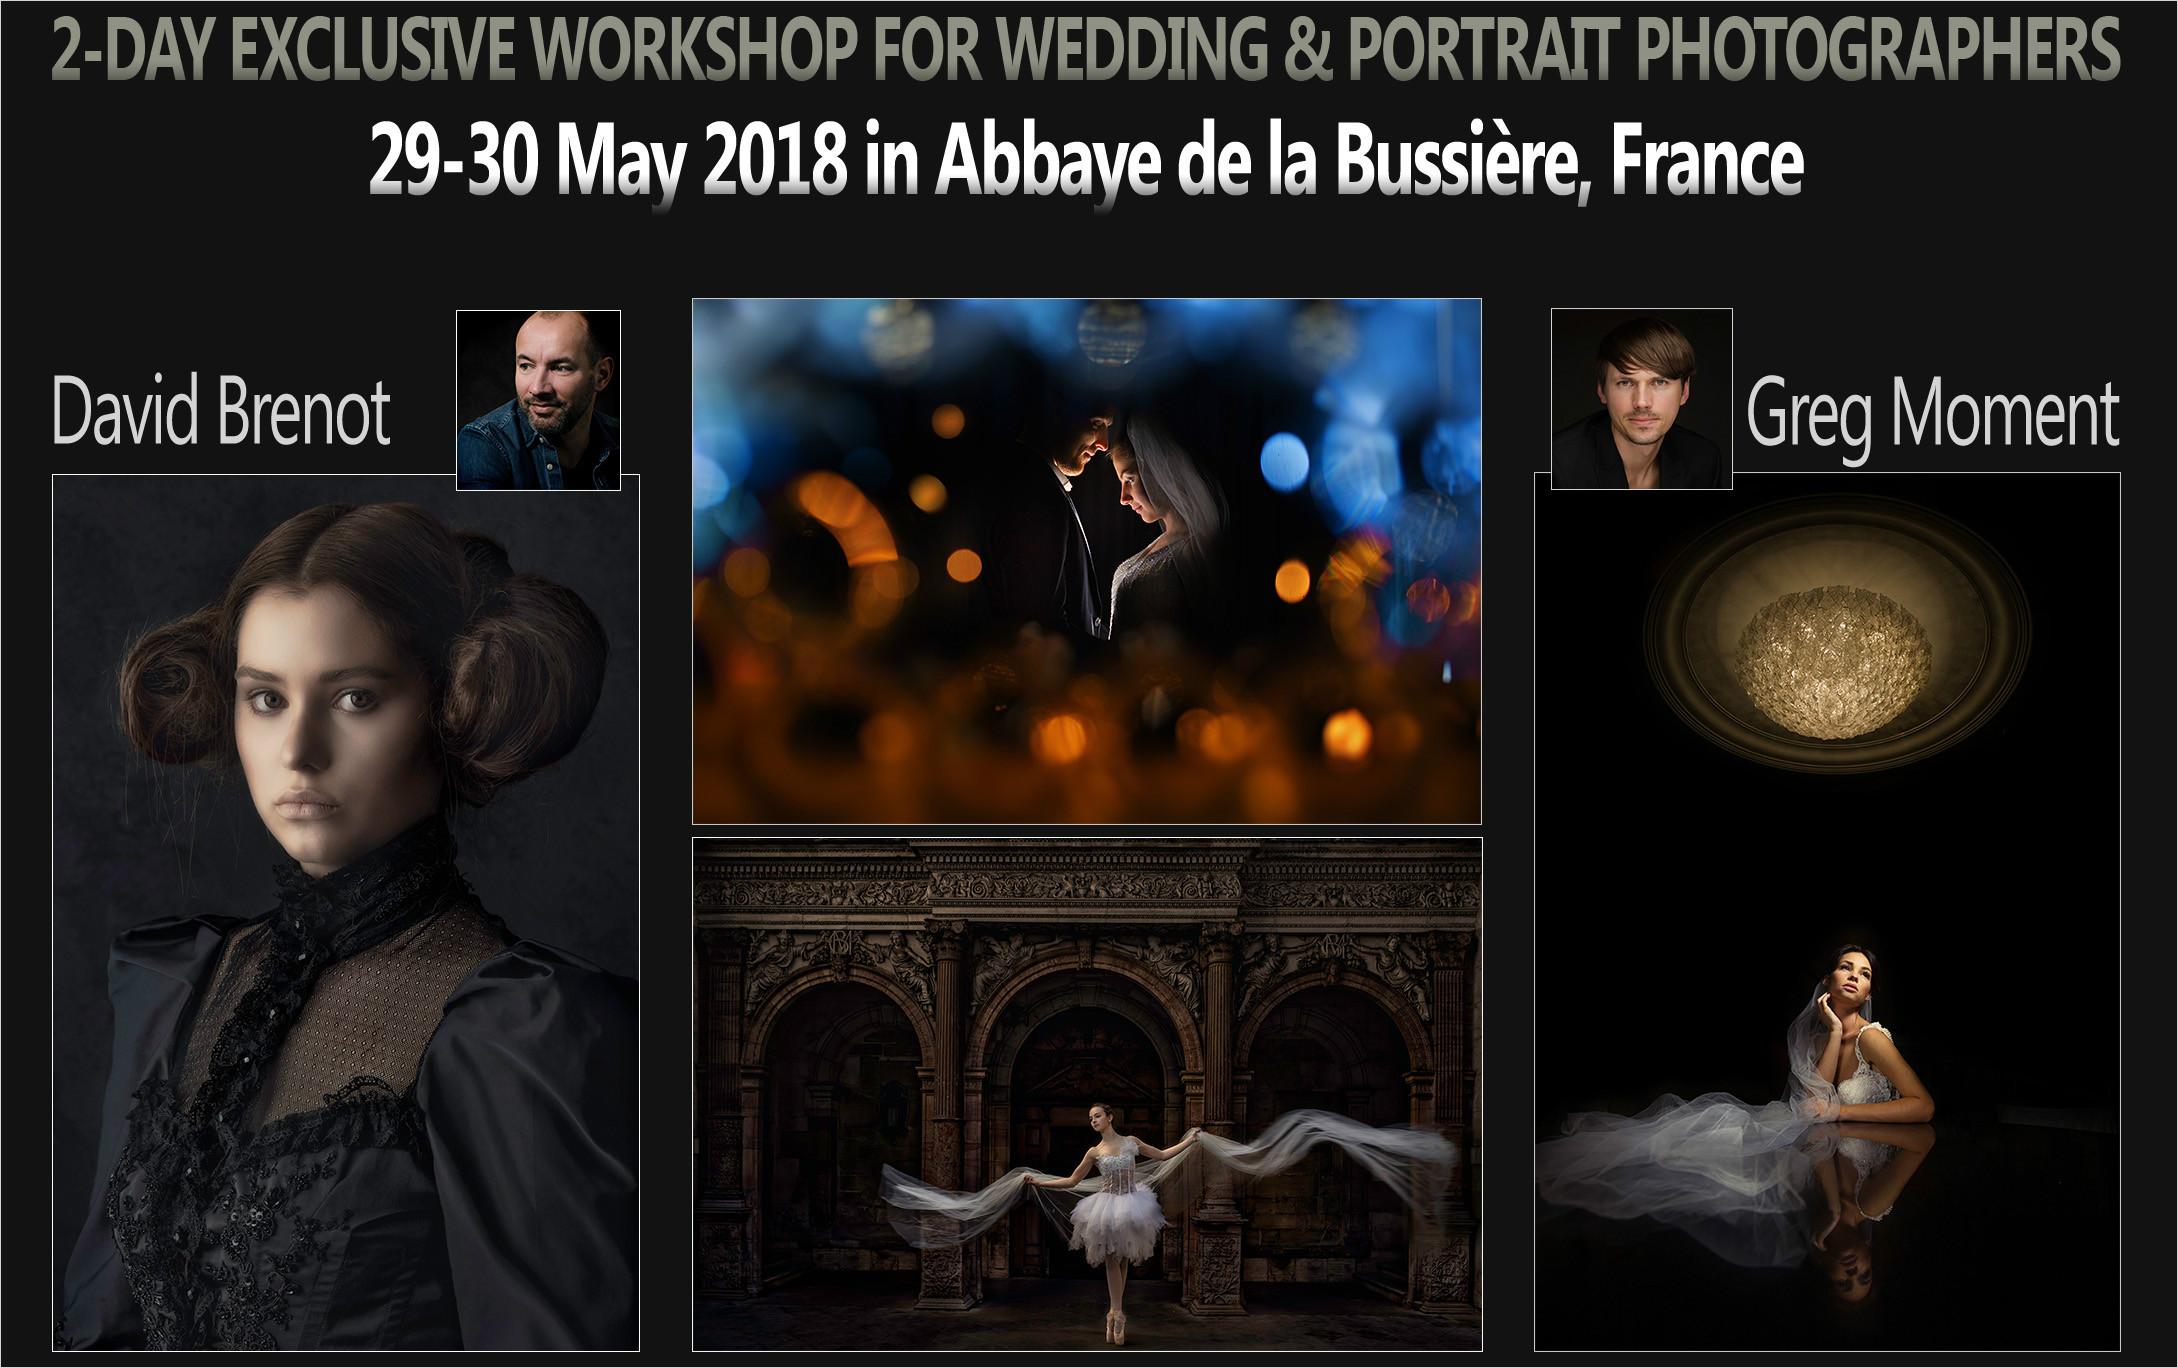 Abbaye de la Bussière, France - 29/30.05.2018. with David Brenot